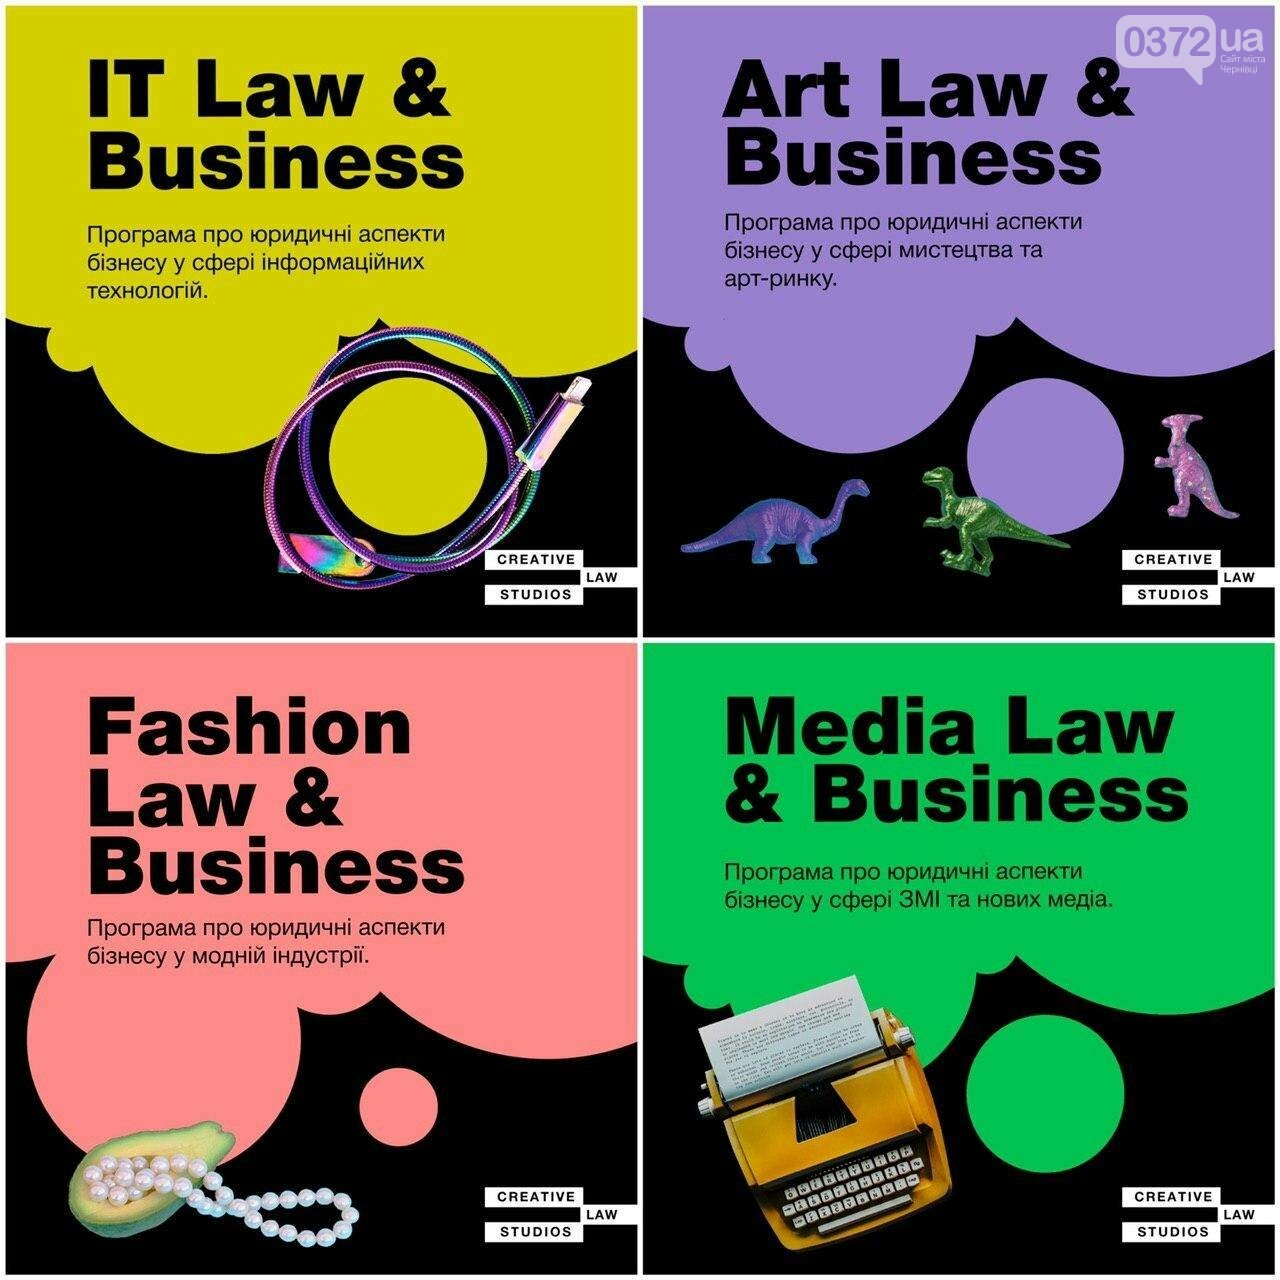 Creative Law Studios